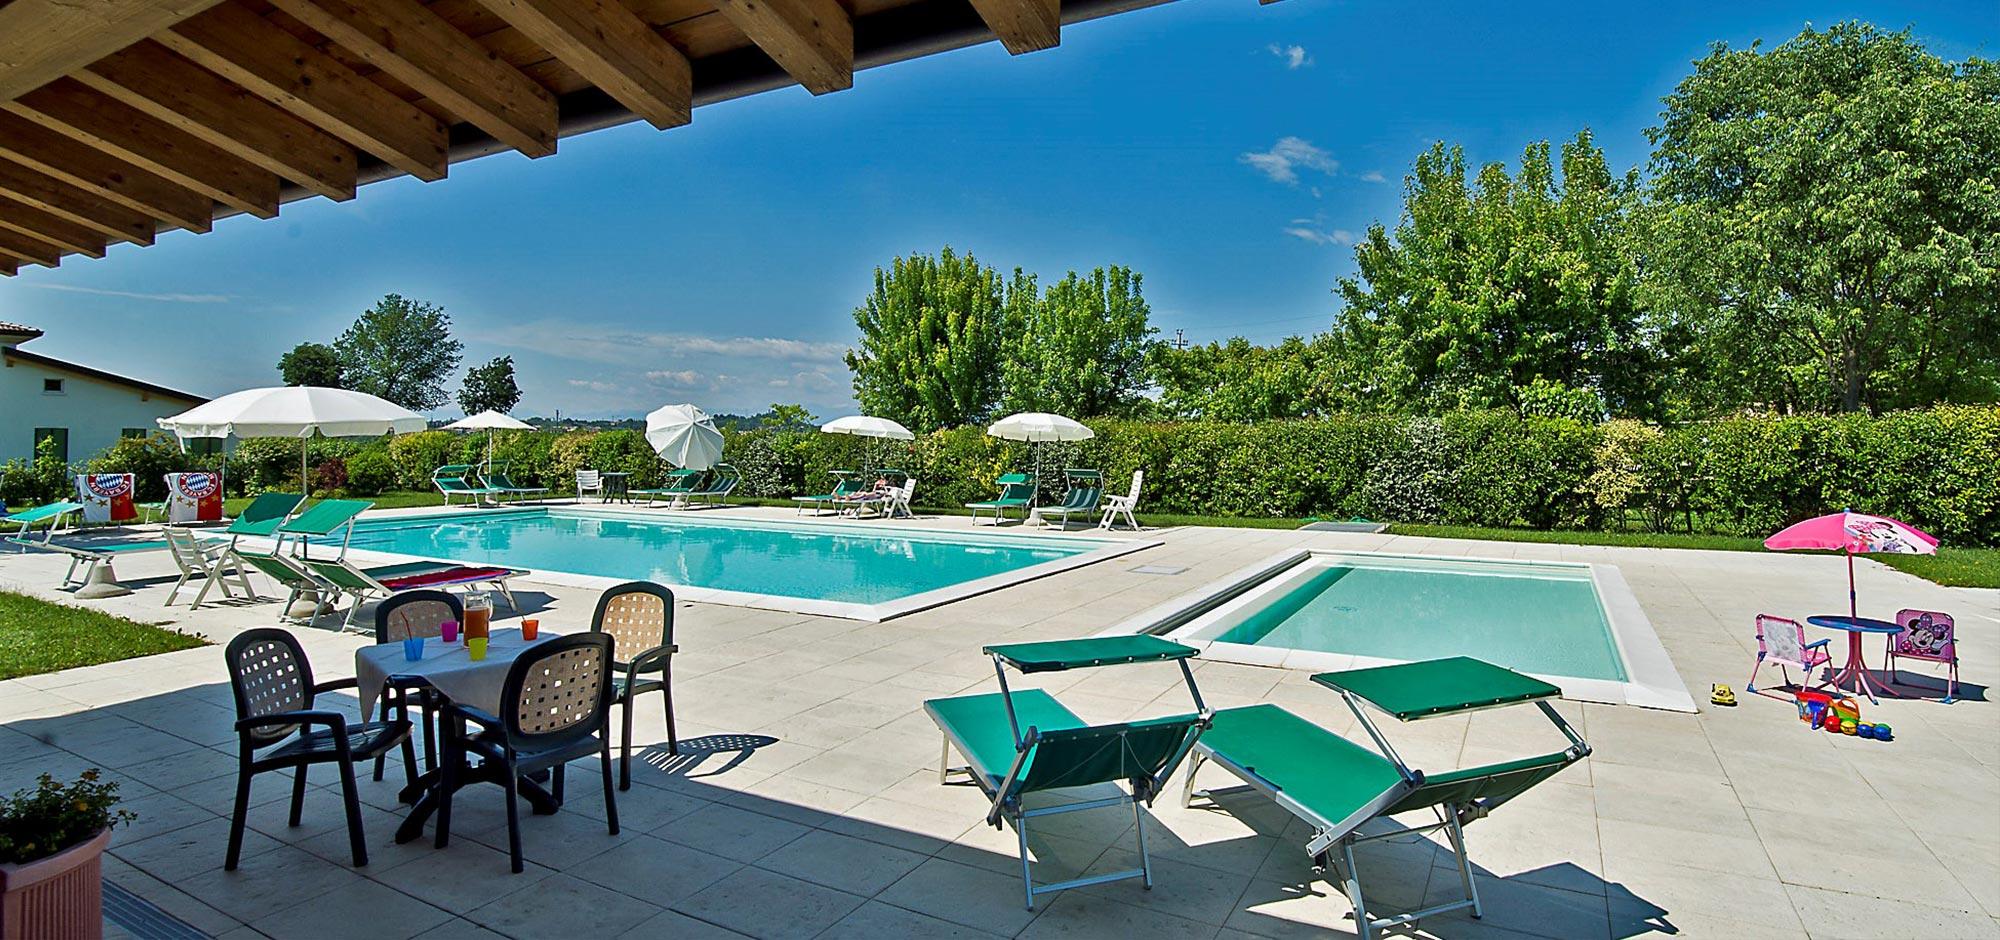 giardino-piscina-2